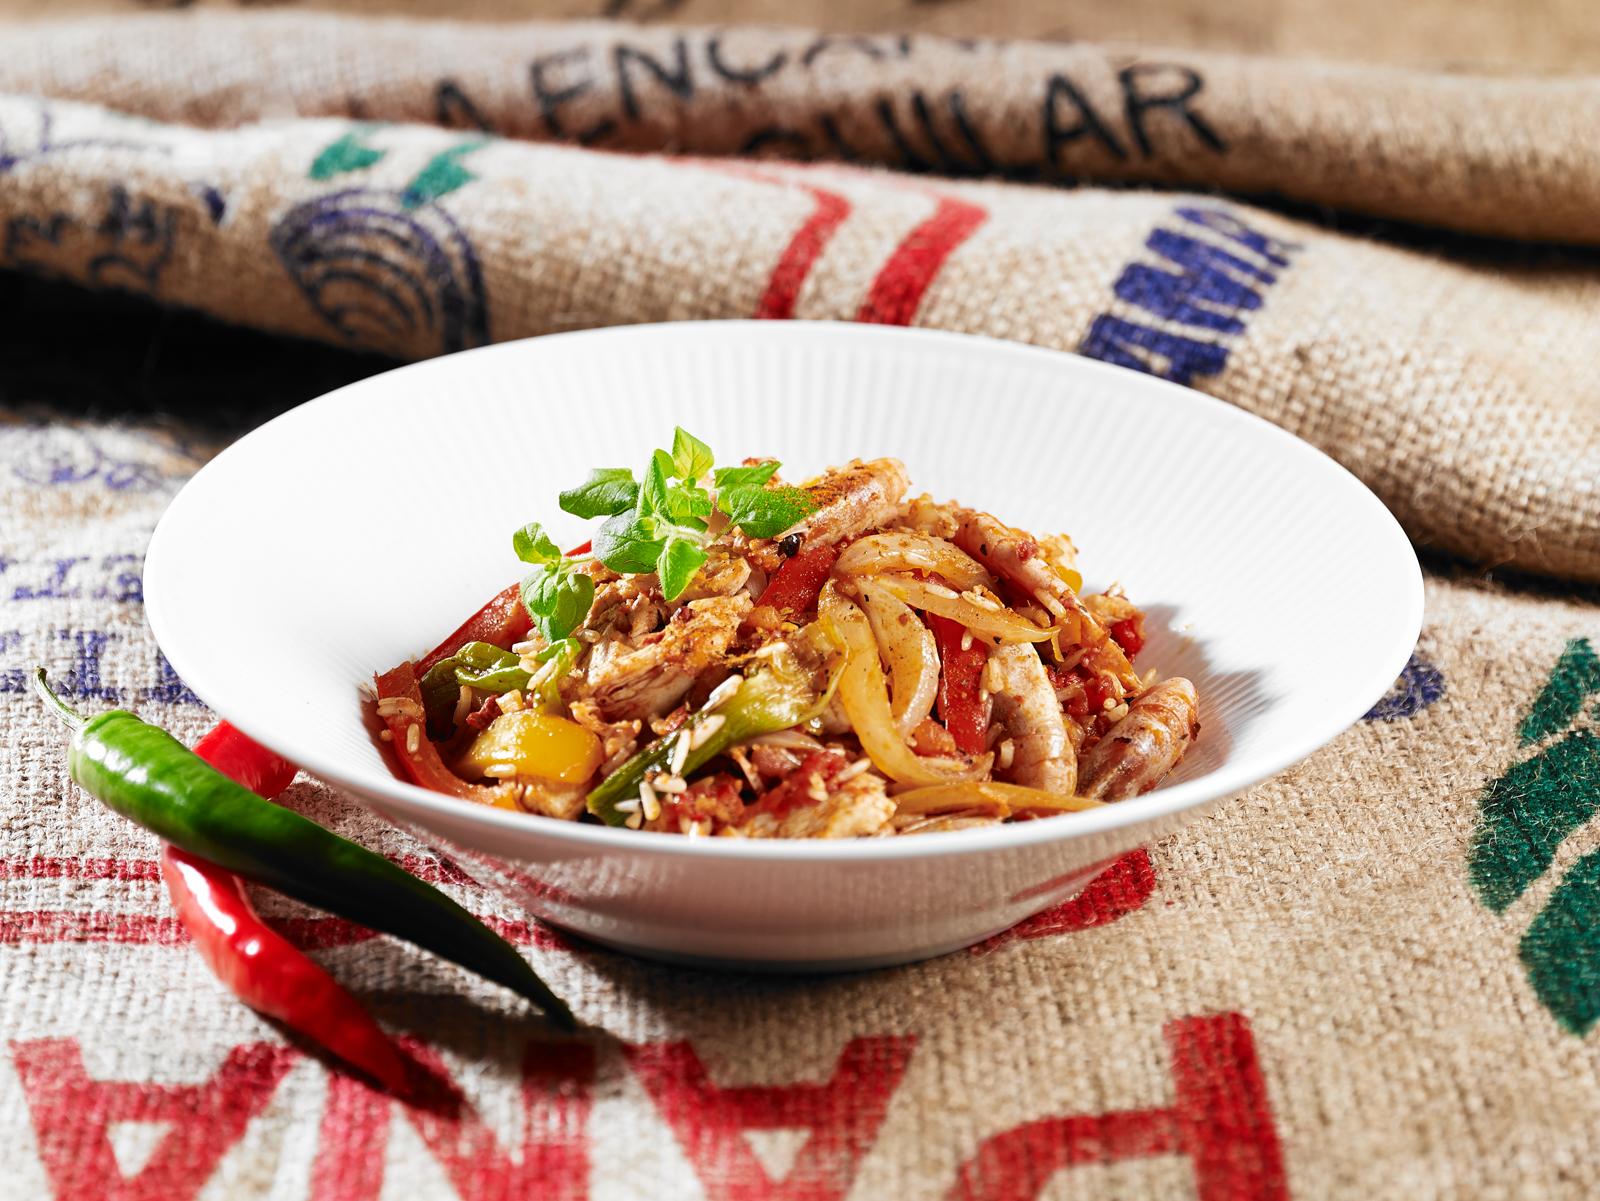 chili cookbook_004.jpg